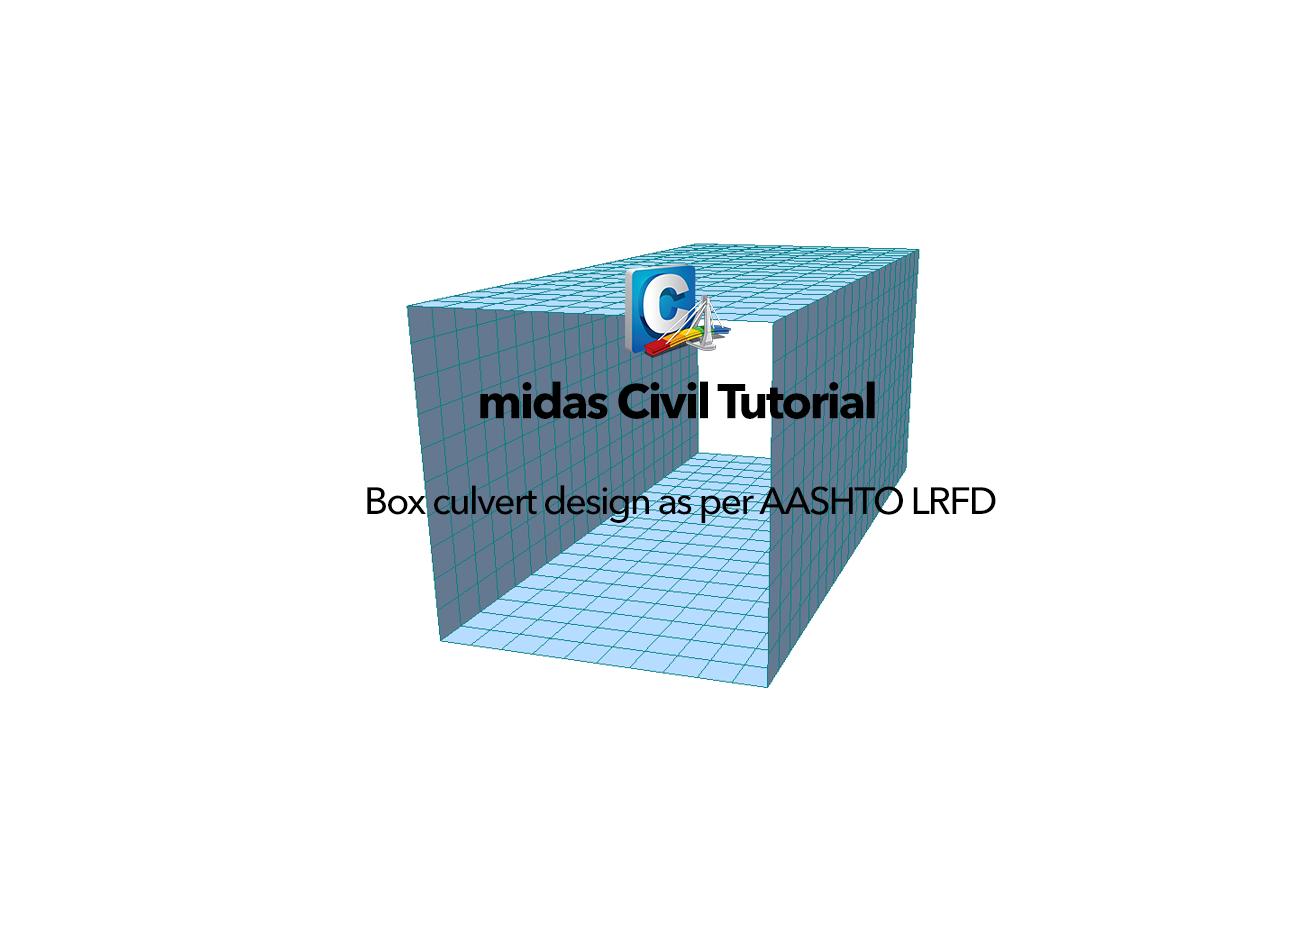 Box culvert design as per AASHTO LRFD